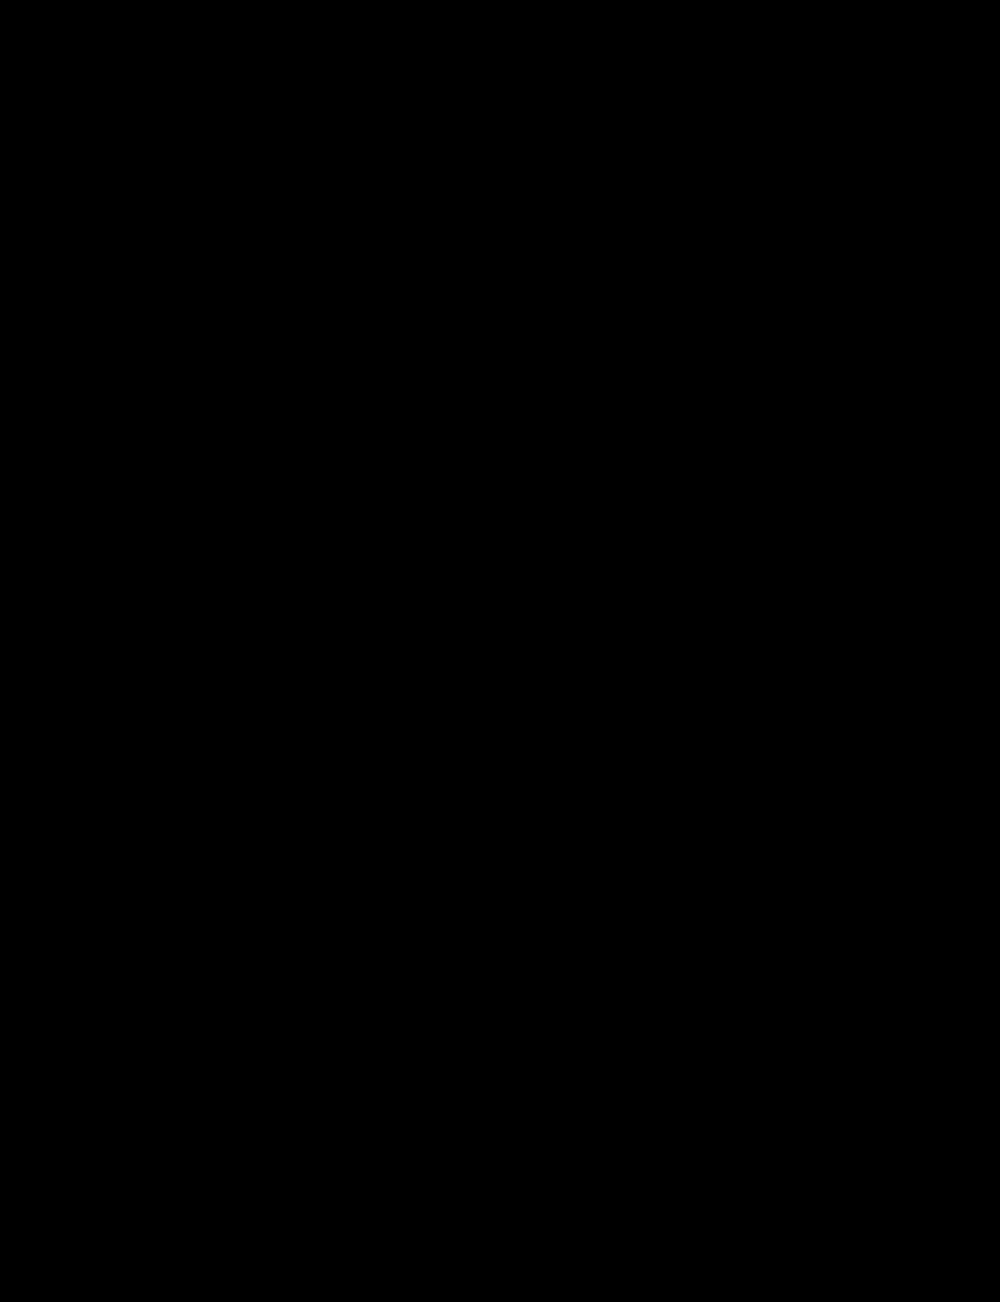 Frange médiŽévale